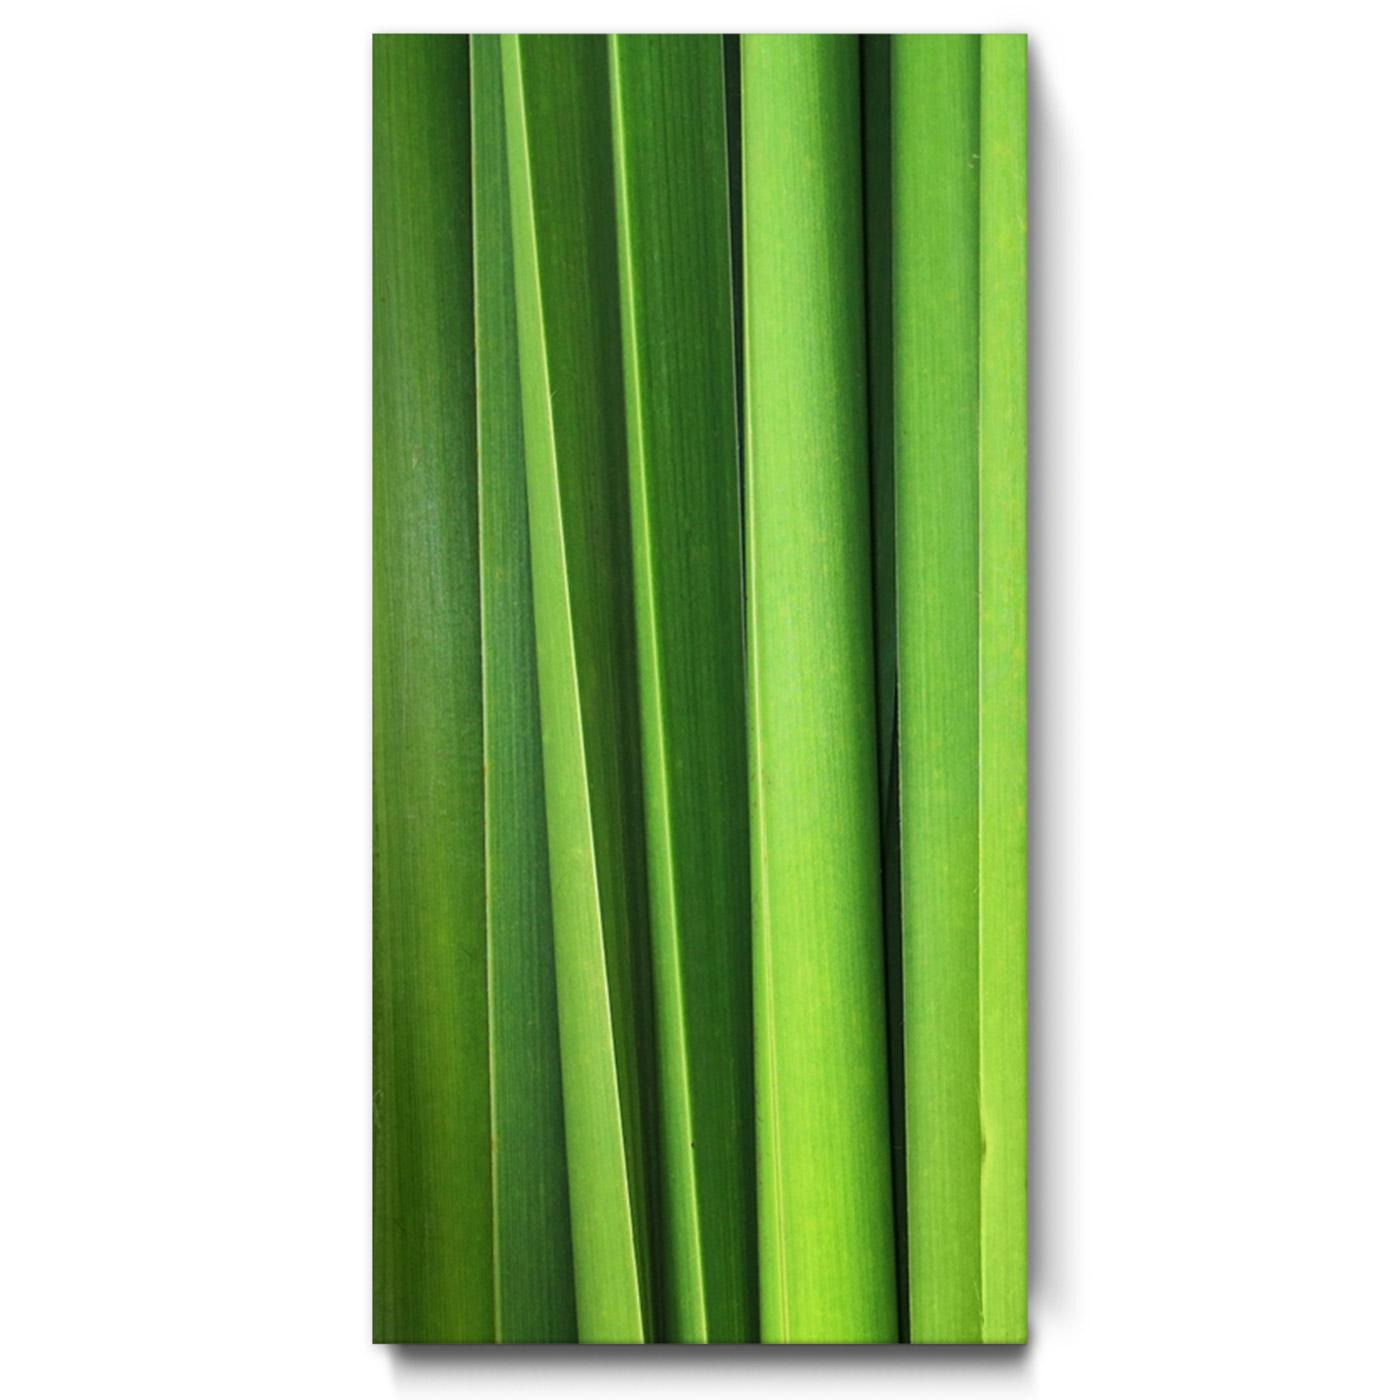 Akustikbild bambus die akustikbild manufaktur - Wandbild hochformat ...